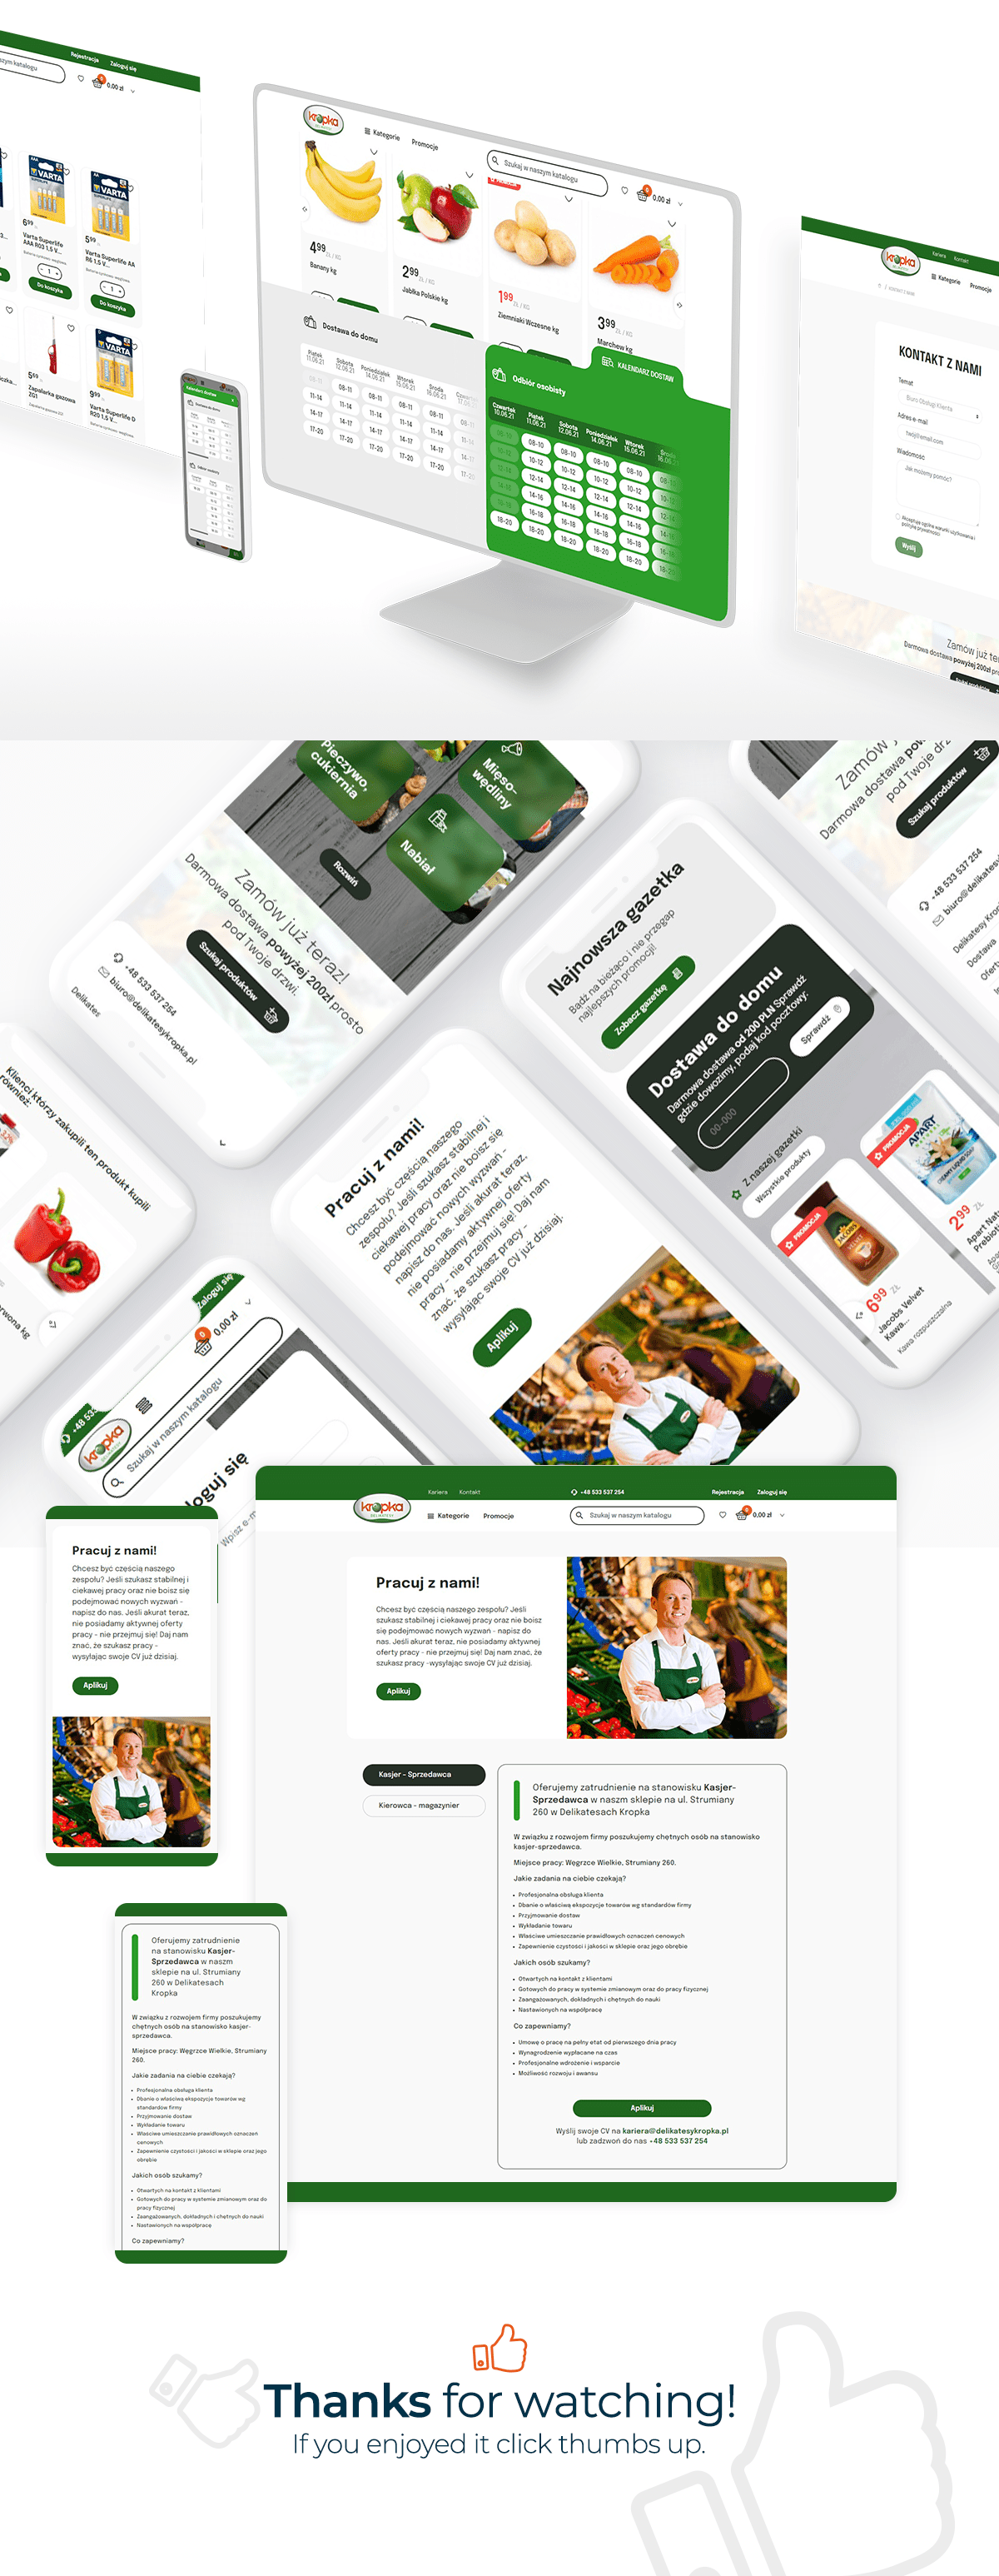 delivery delivery calendar desktop green Grocery icons mobile Order store vegetables